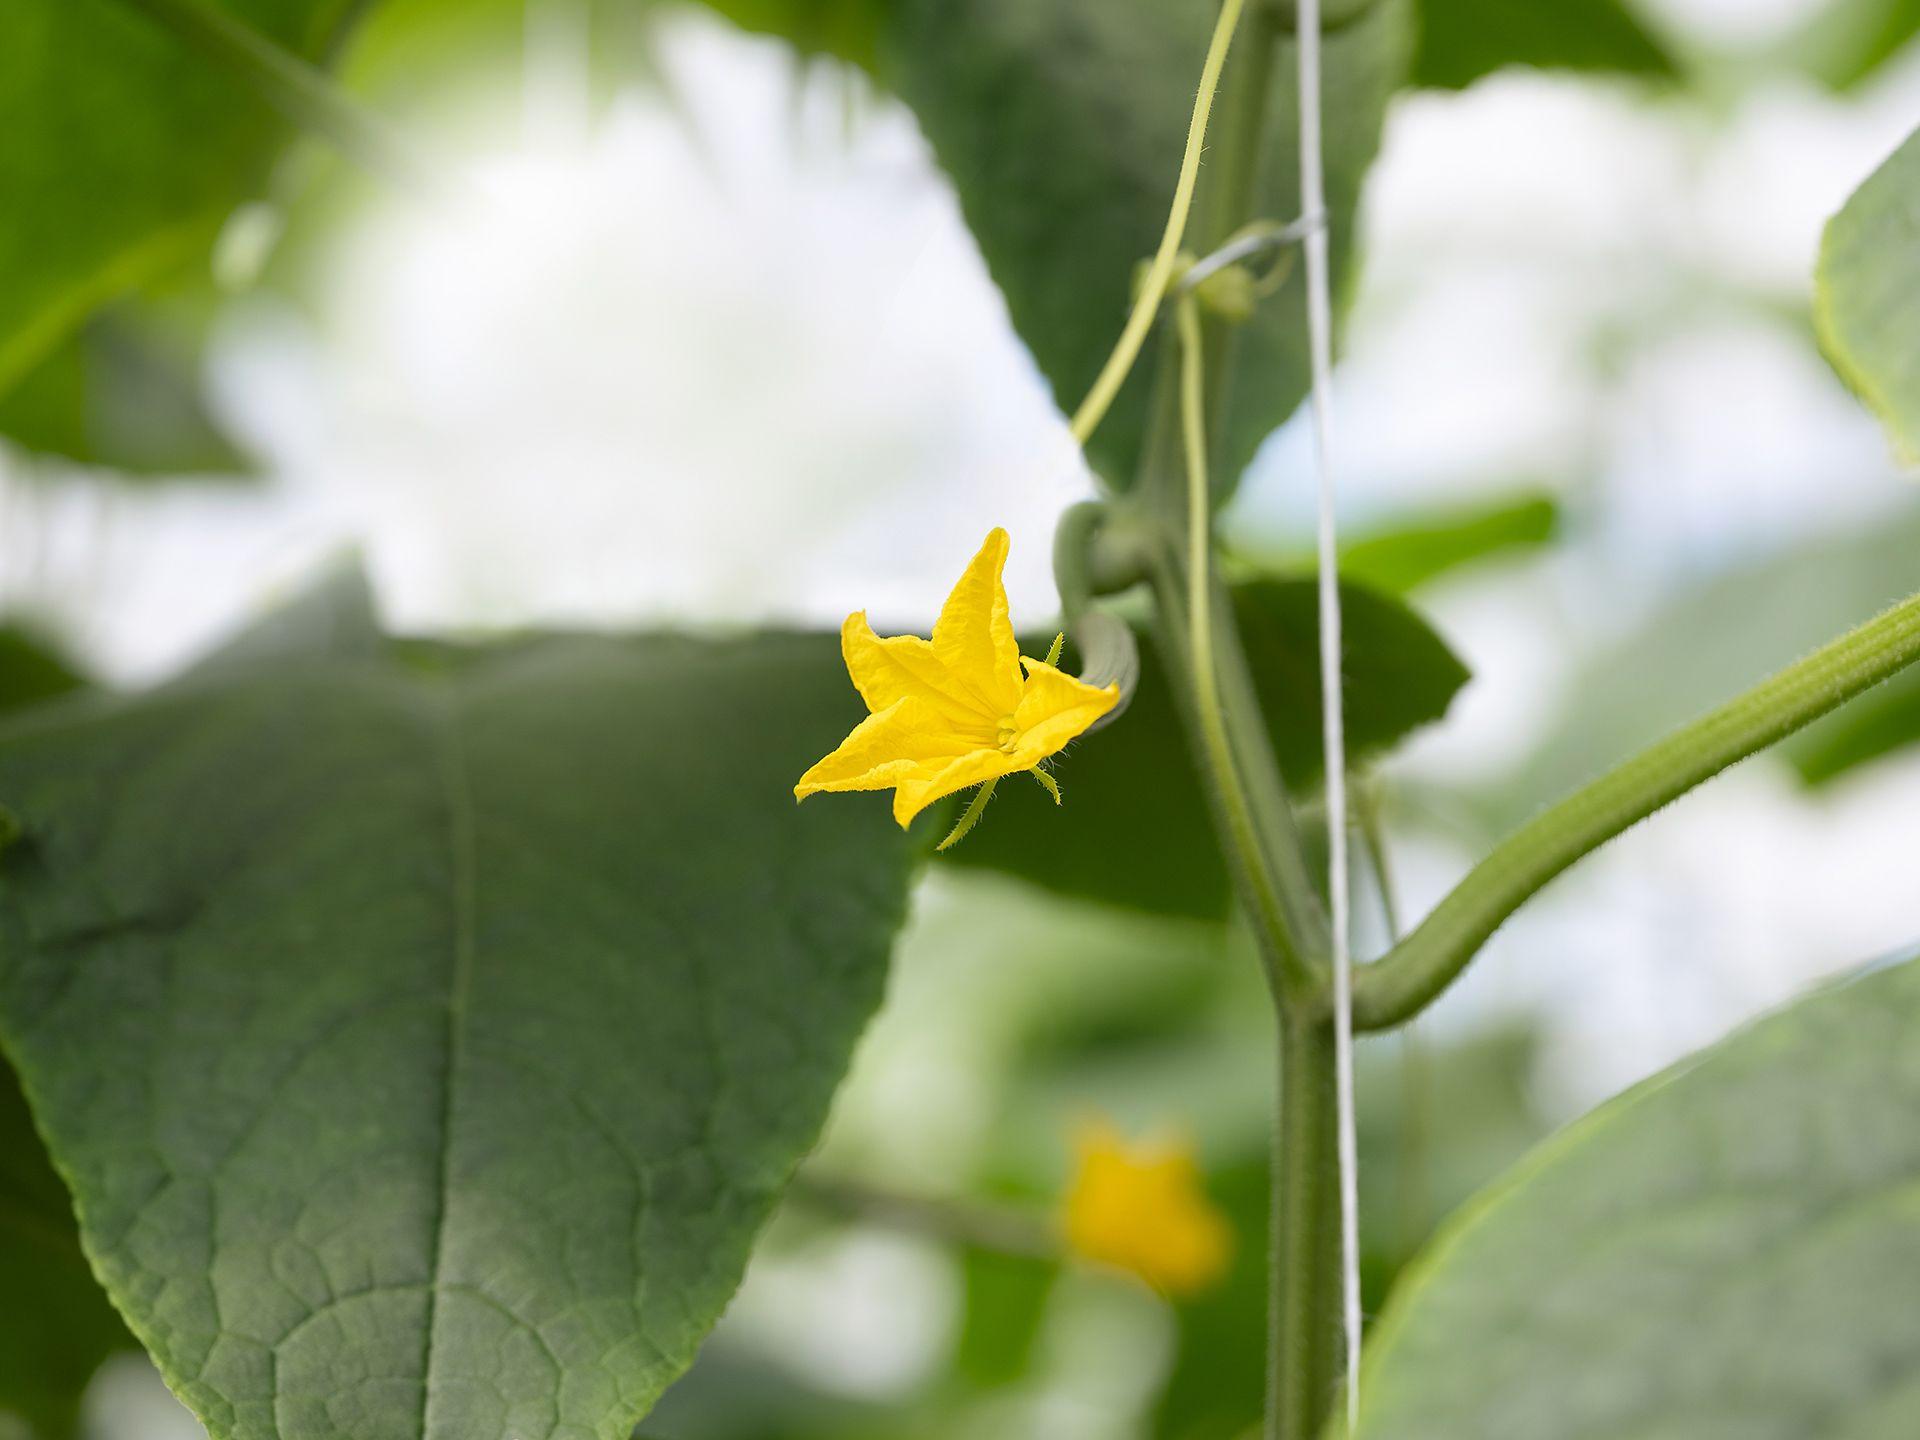 Close-up of zucchini flower.